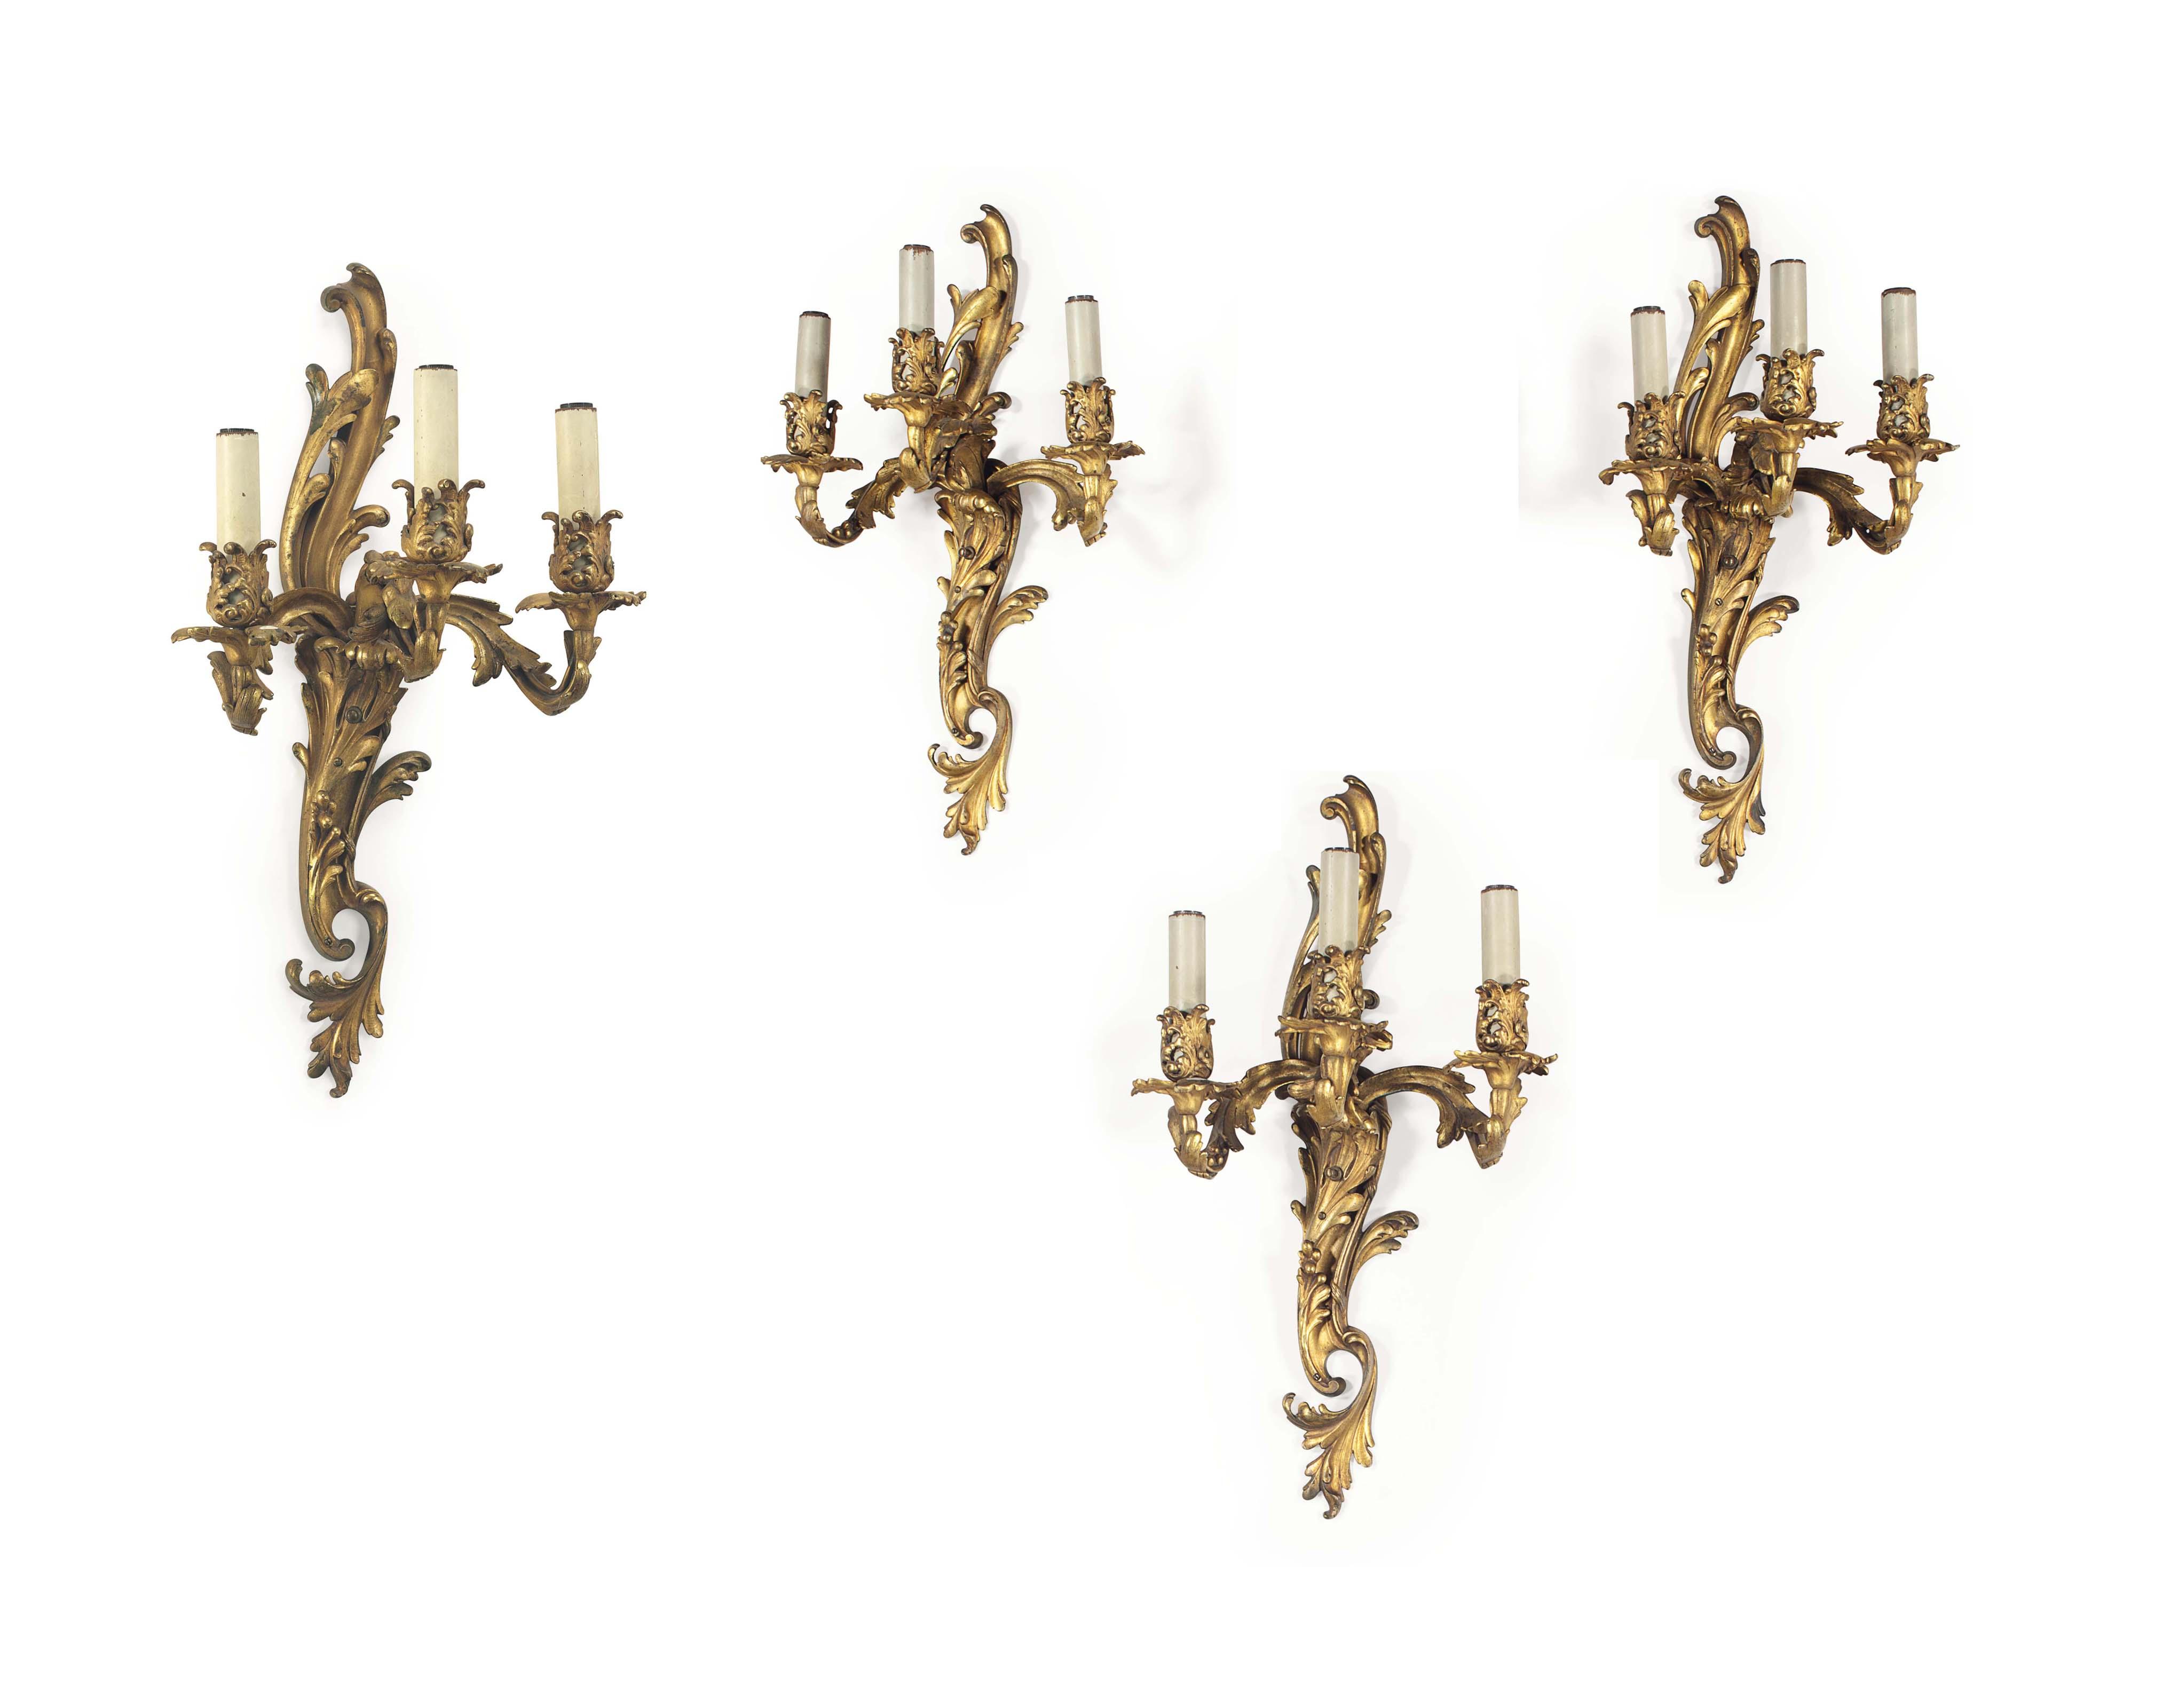 A SET OF SIX ORMOLU THREE-LIGHT WALL LIGHTS